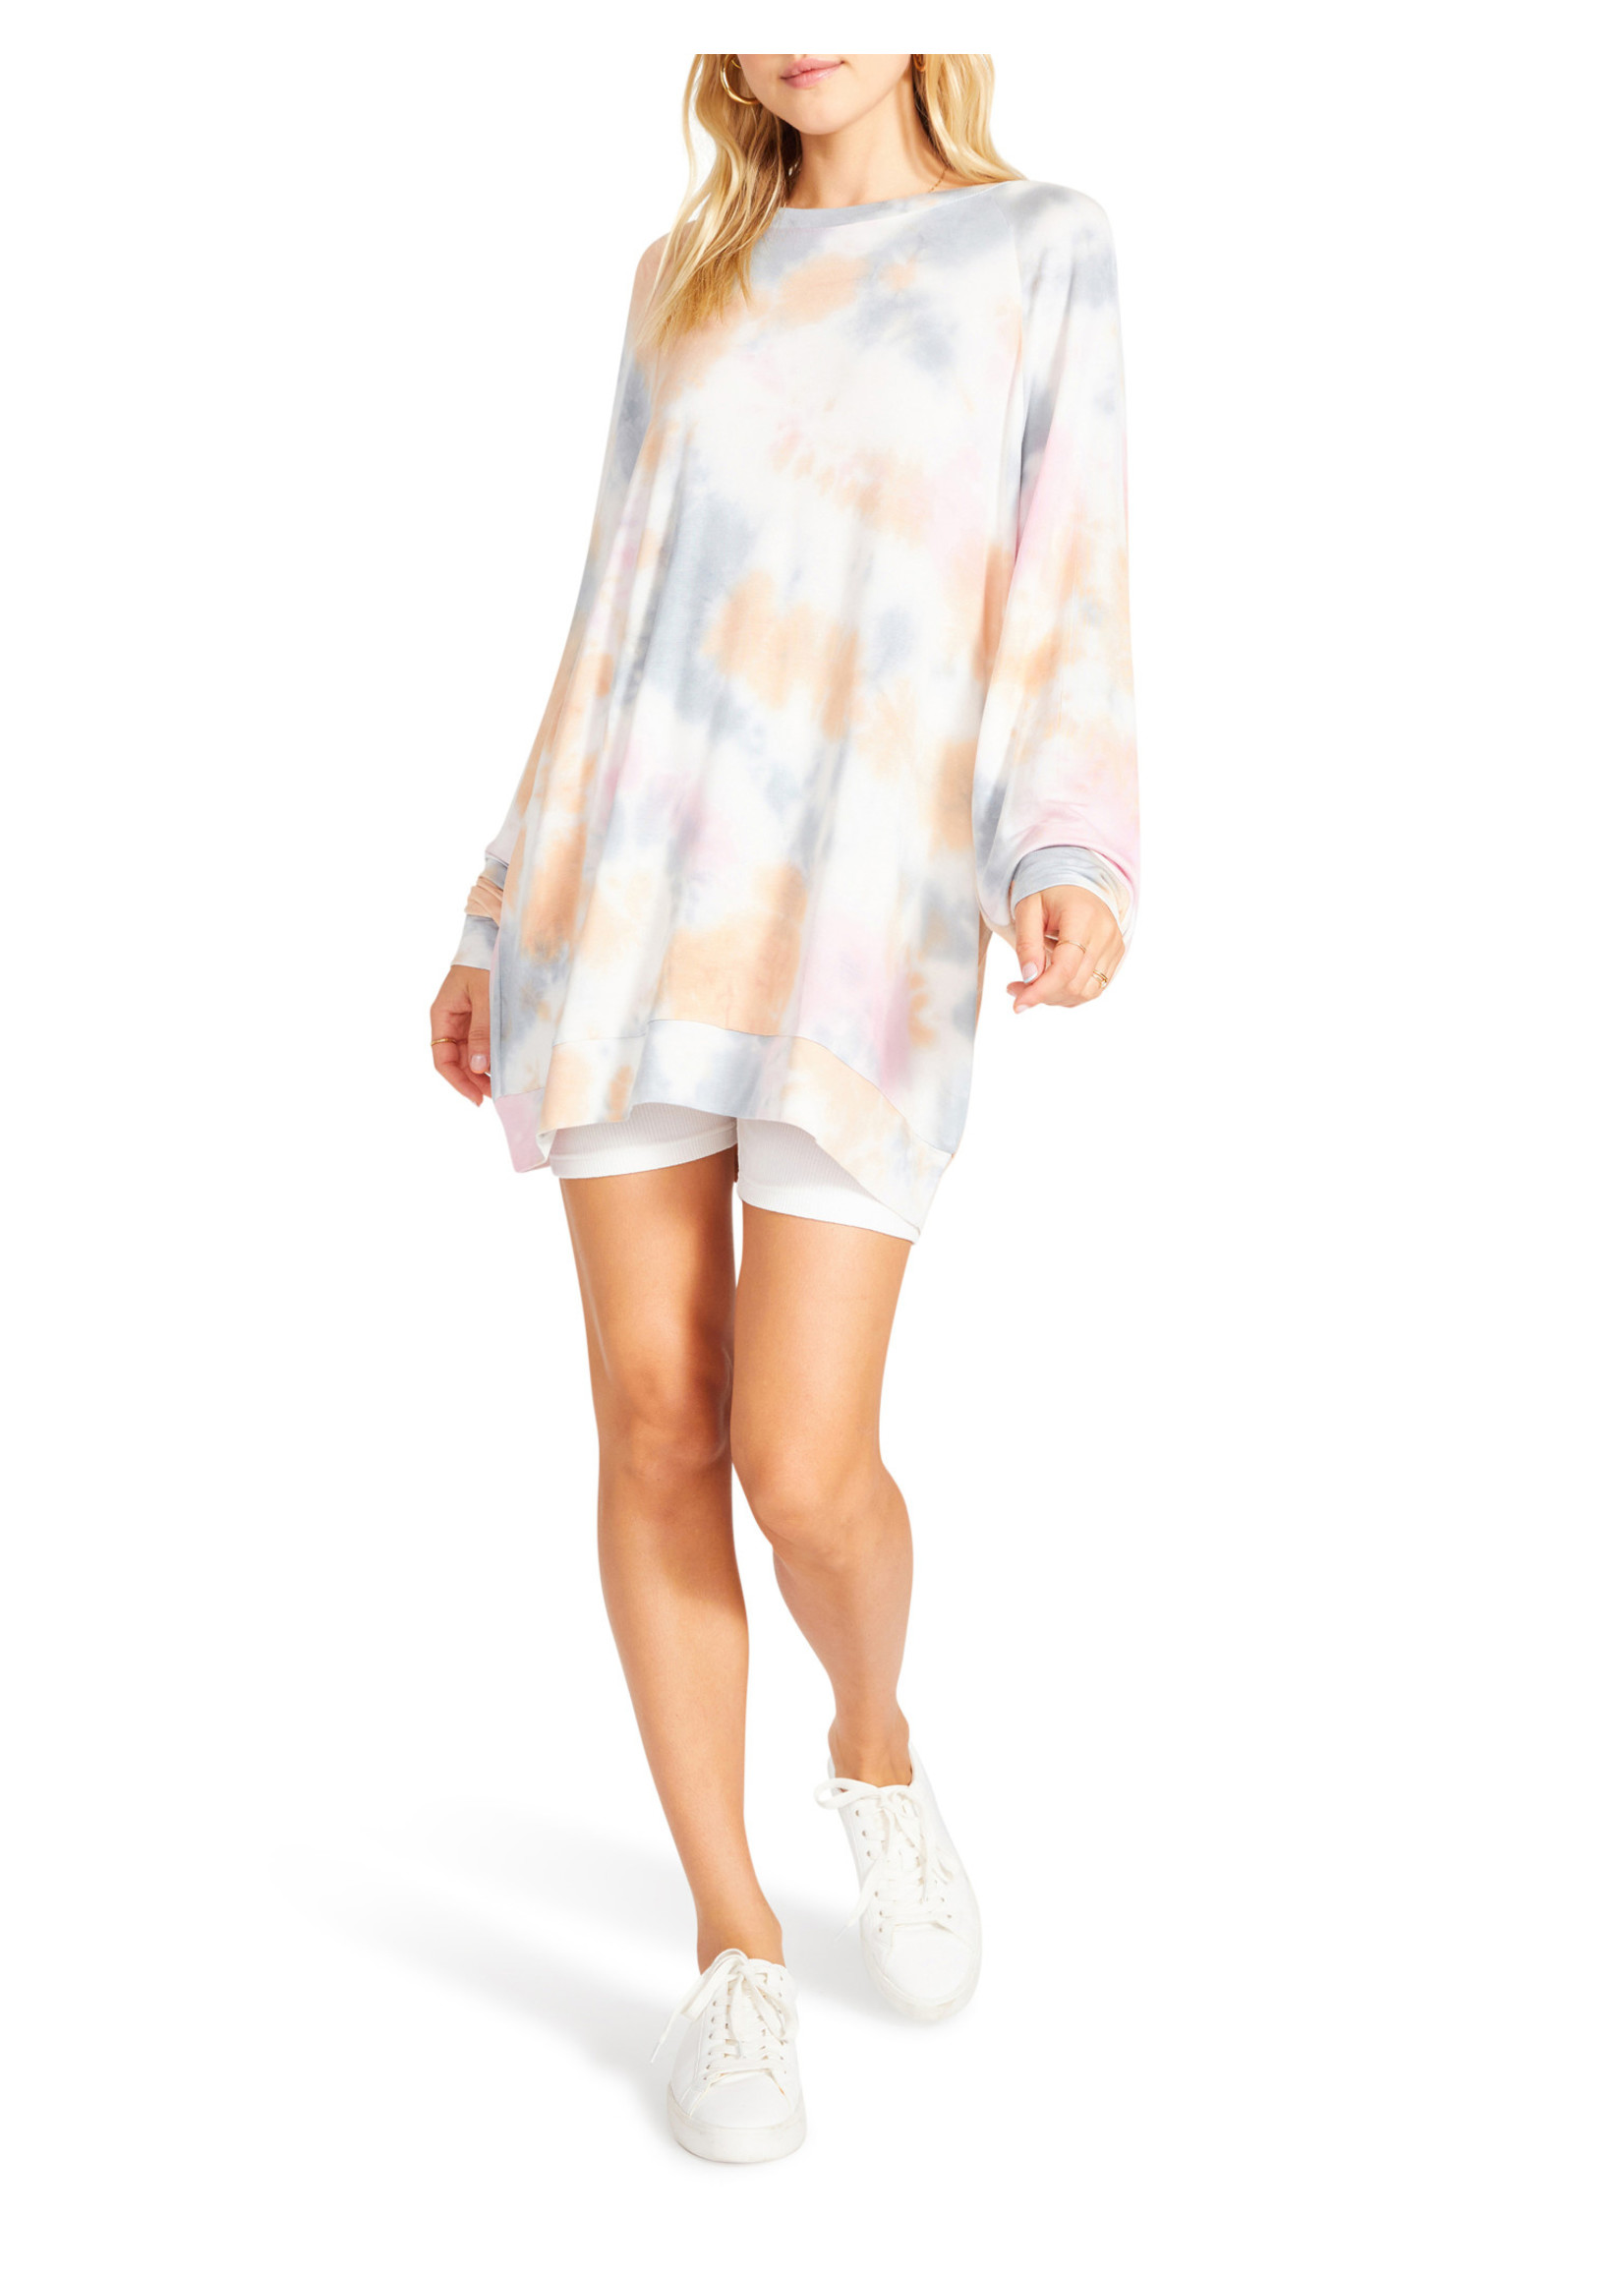 BB Dakota Dye And Mighty Sweatshirt - BL205383